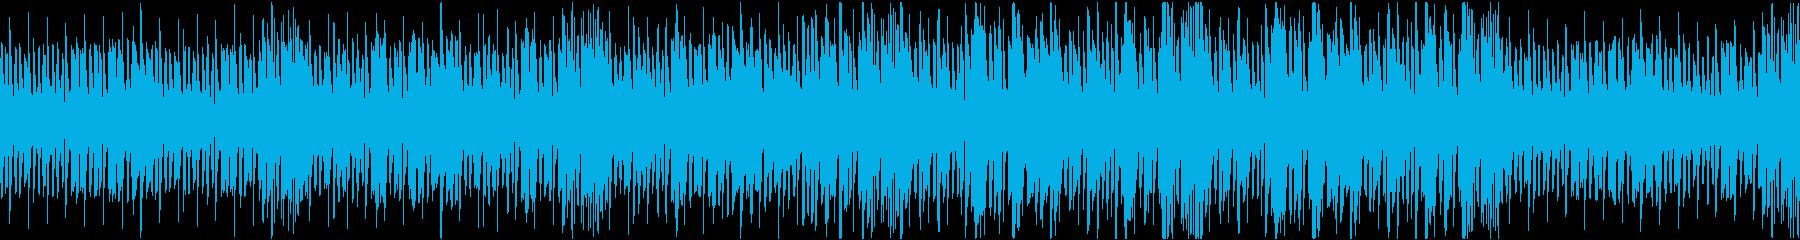 CM・テレビに 明るくワクワクする曲の再生済みの波形